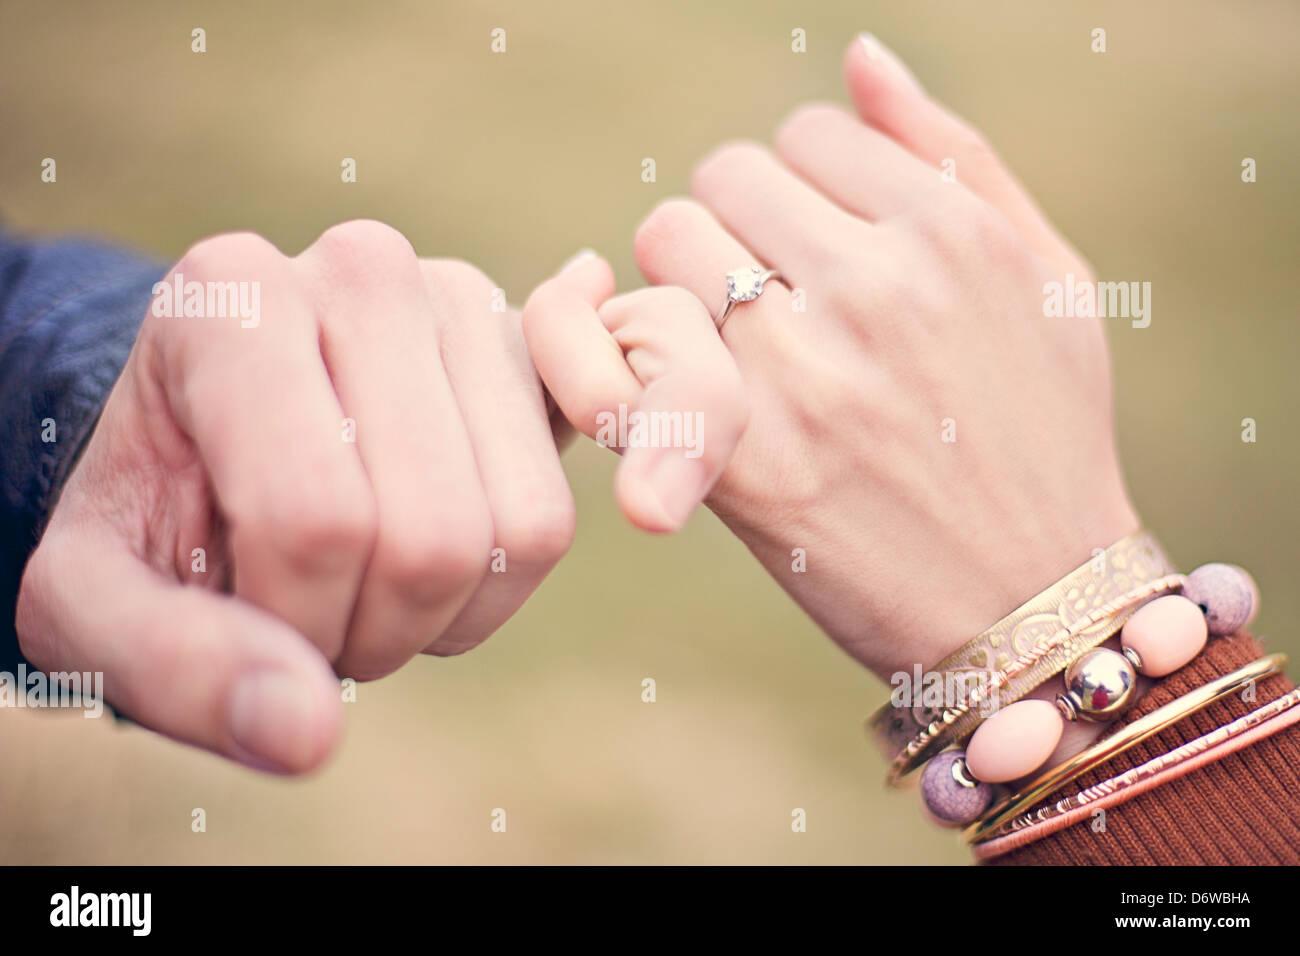 Hande Pakt Verlobung Verlobungsring Mann Frau Feier Stockfoto